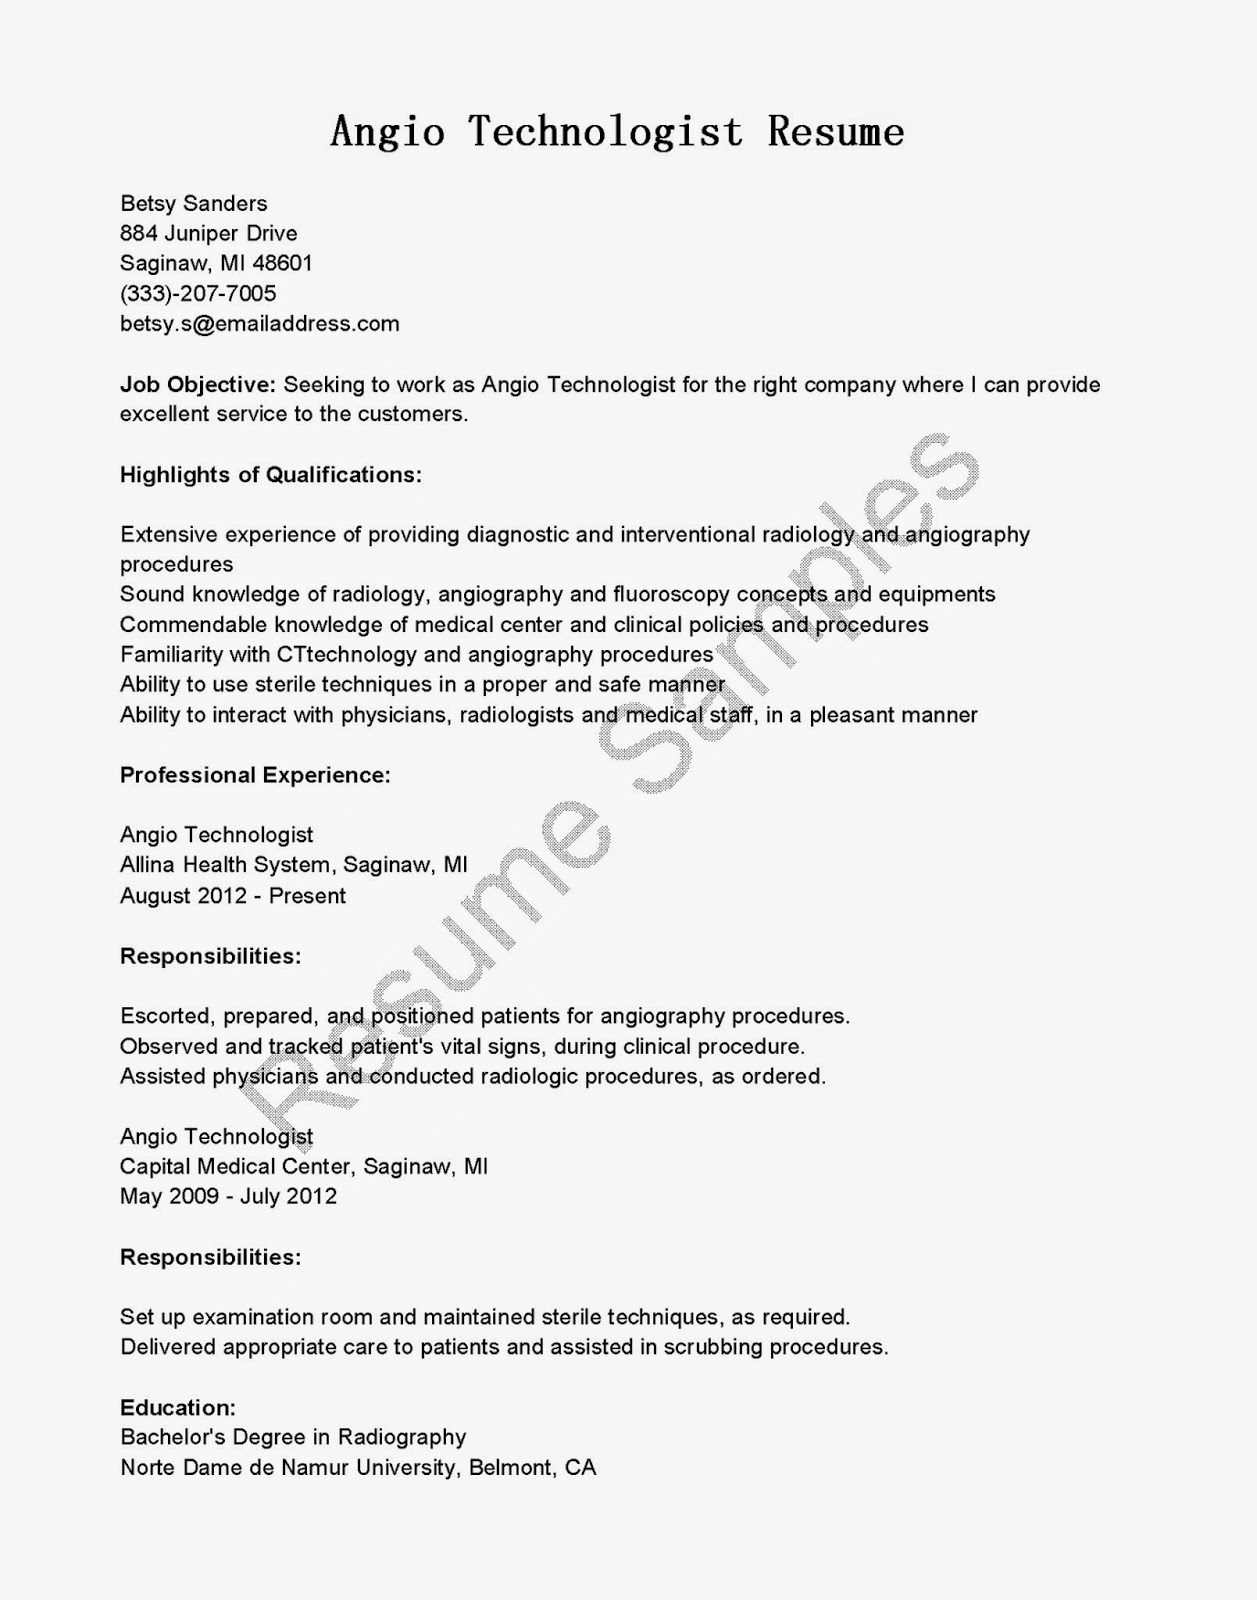 Resume Samples Angio Technologist Resume Sample